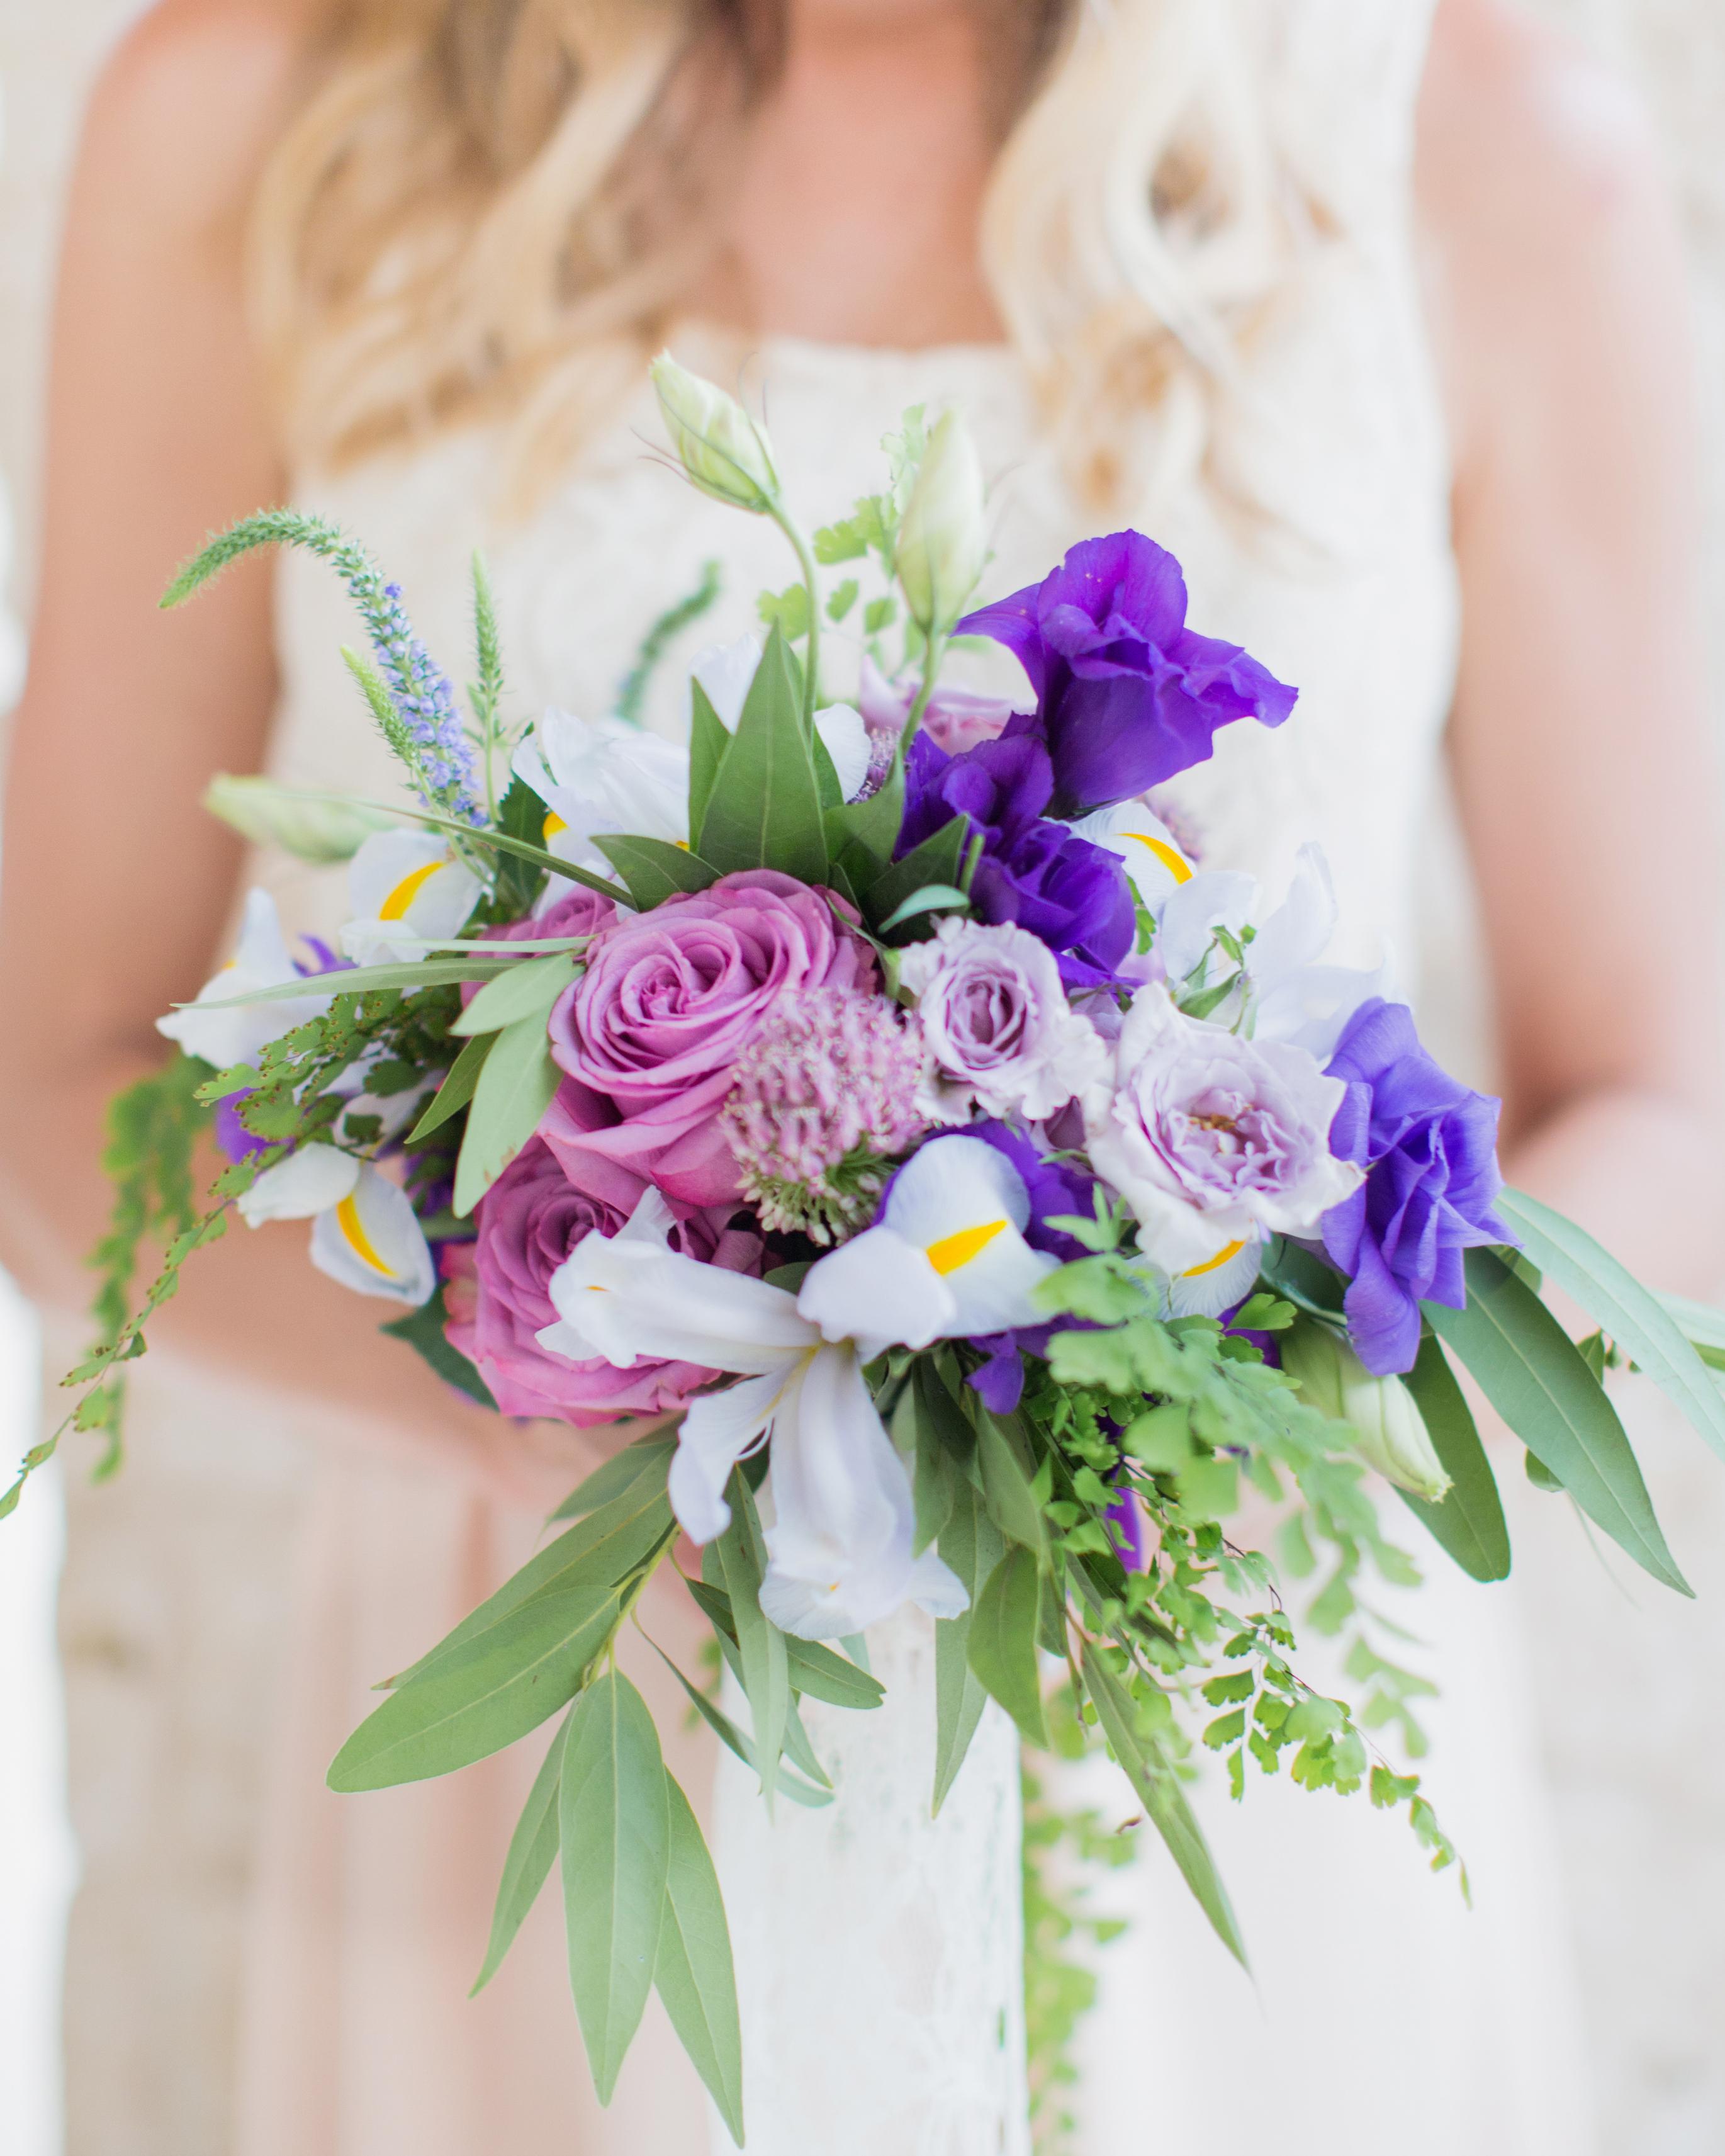 renee-matthew-wedding-maui-hawaii-morison-012-s111851.jpg